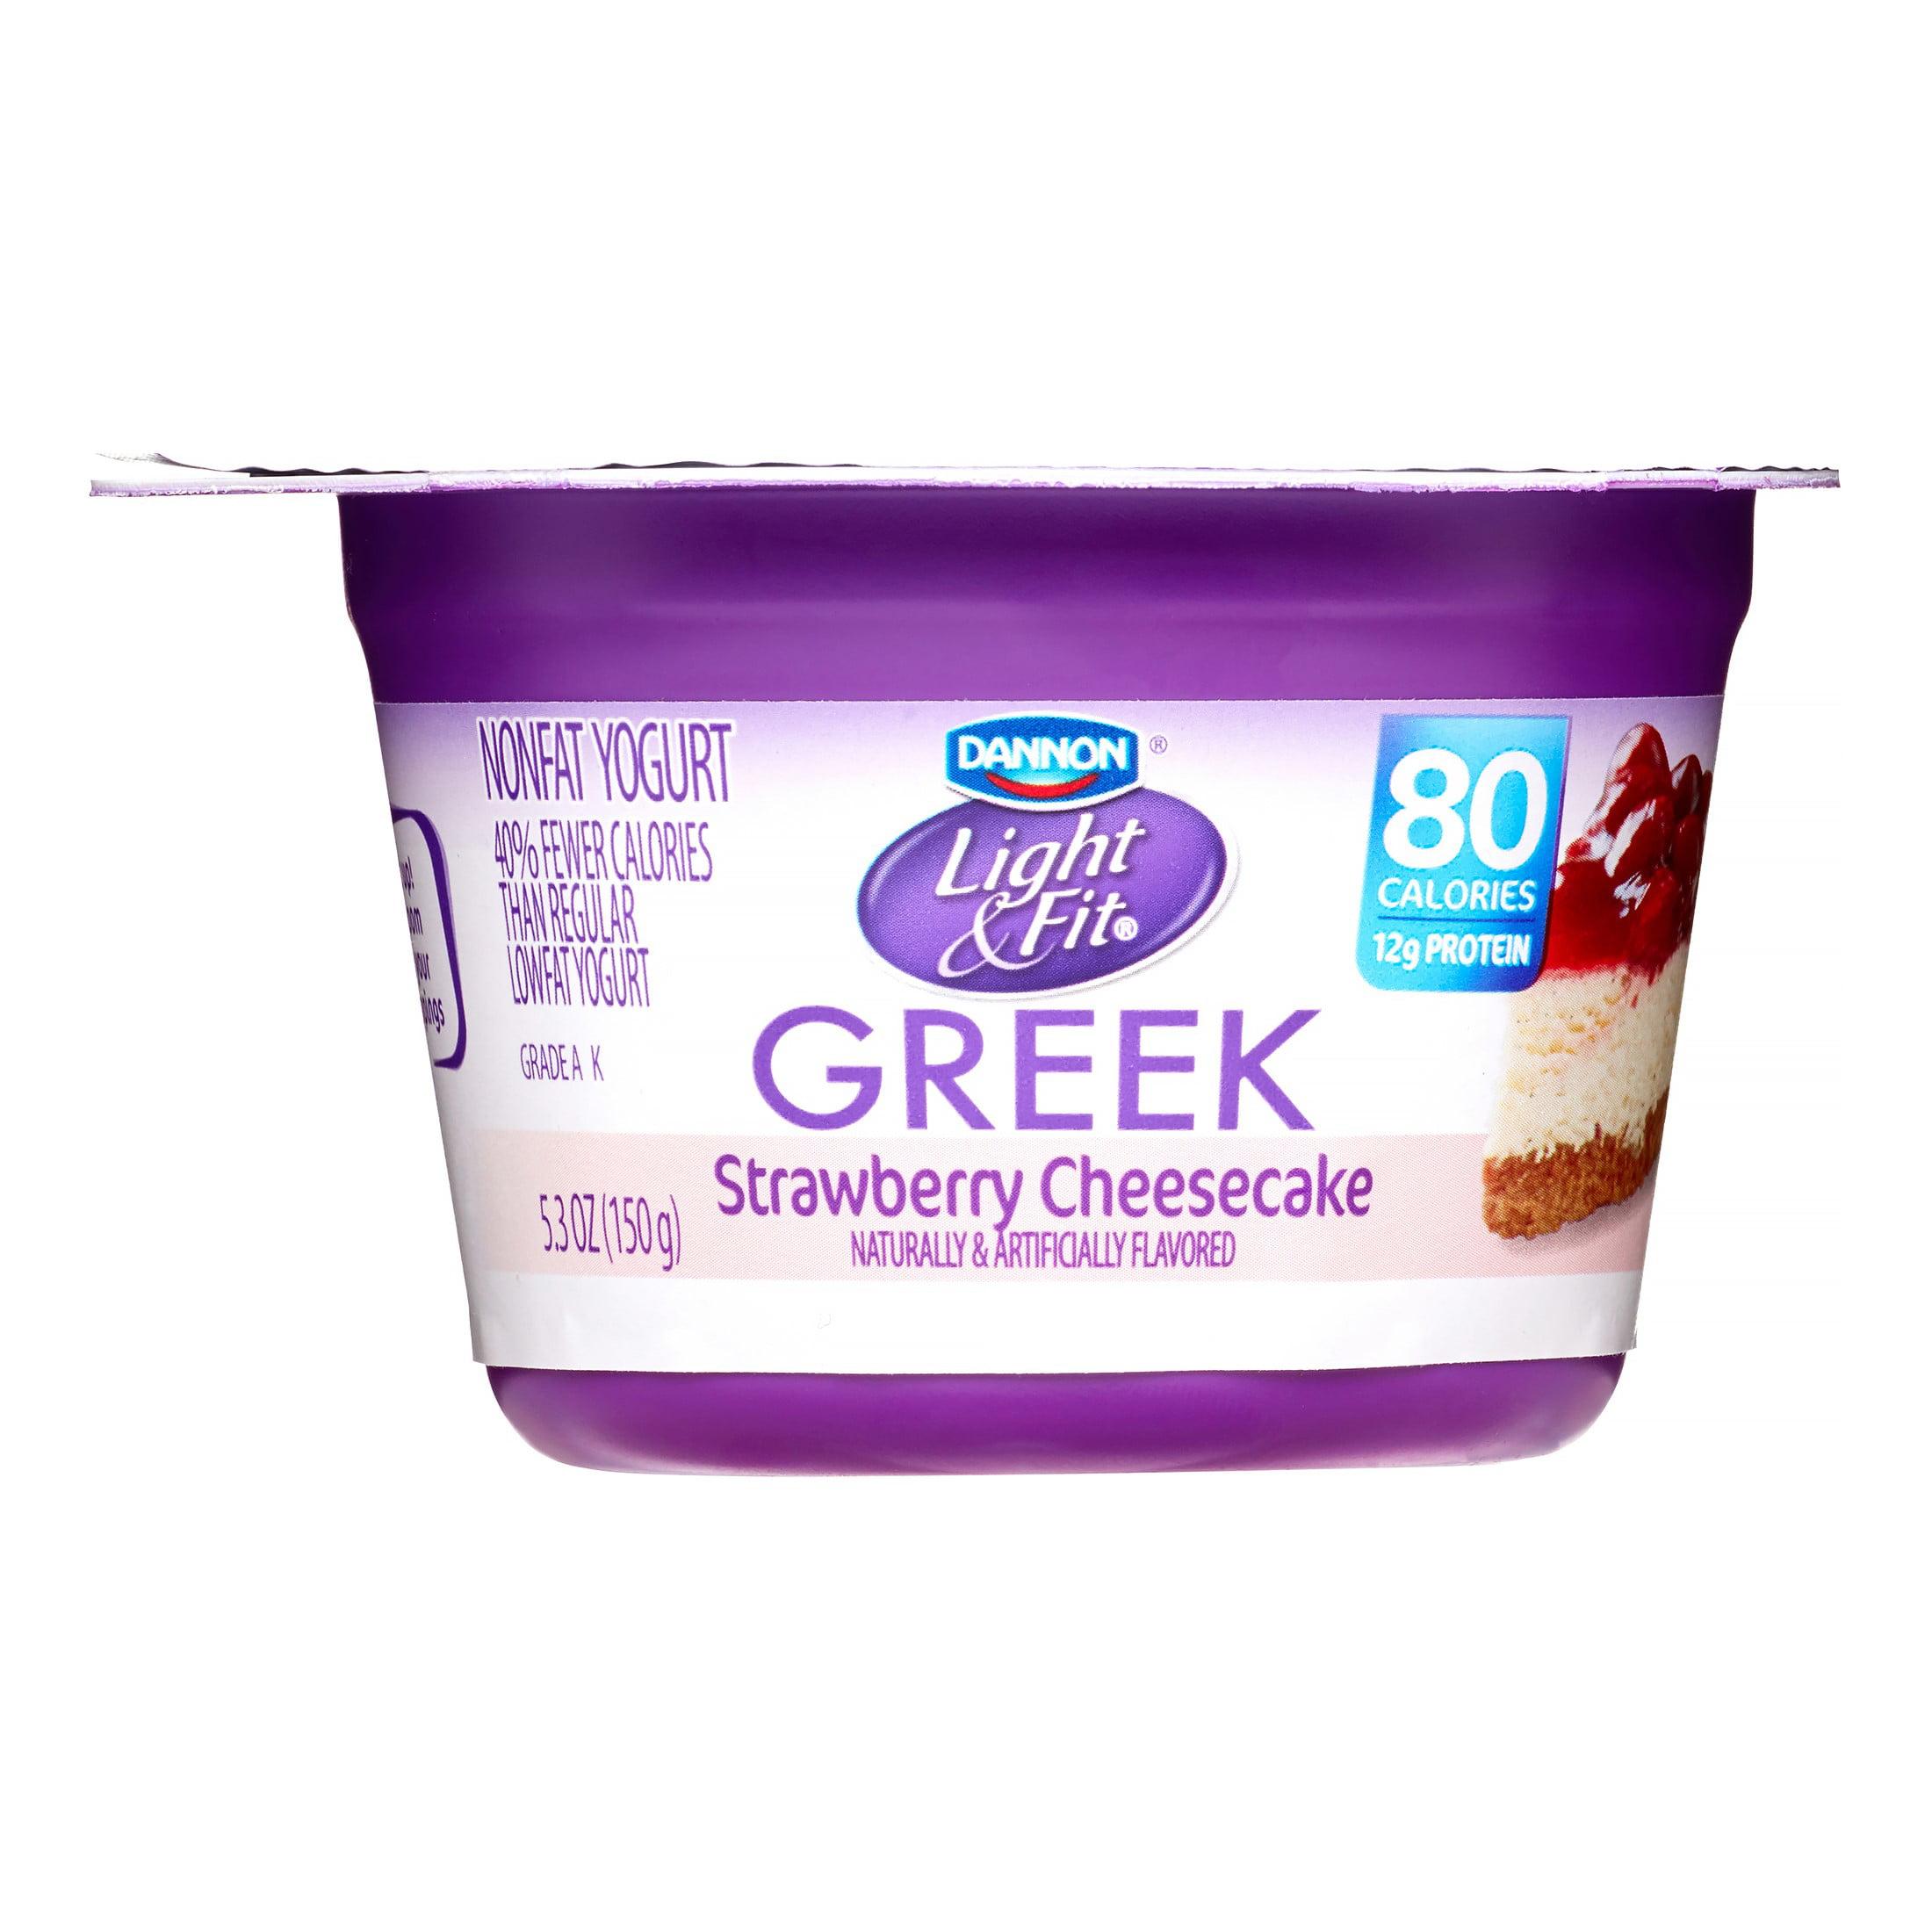 Dannon Light & Fit Strawberry Cheesecake Greek Nonfat Yogurt, 5.3 oz, 4 ct